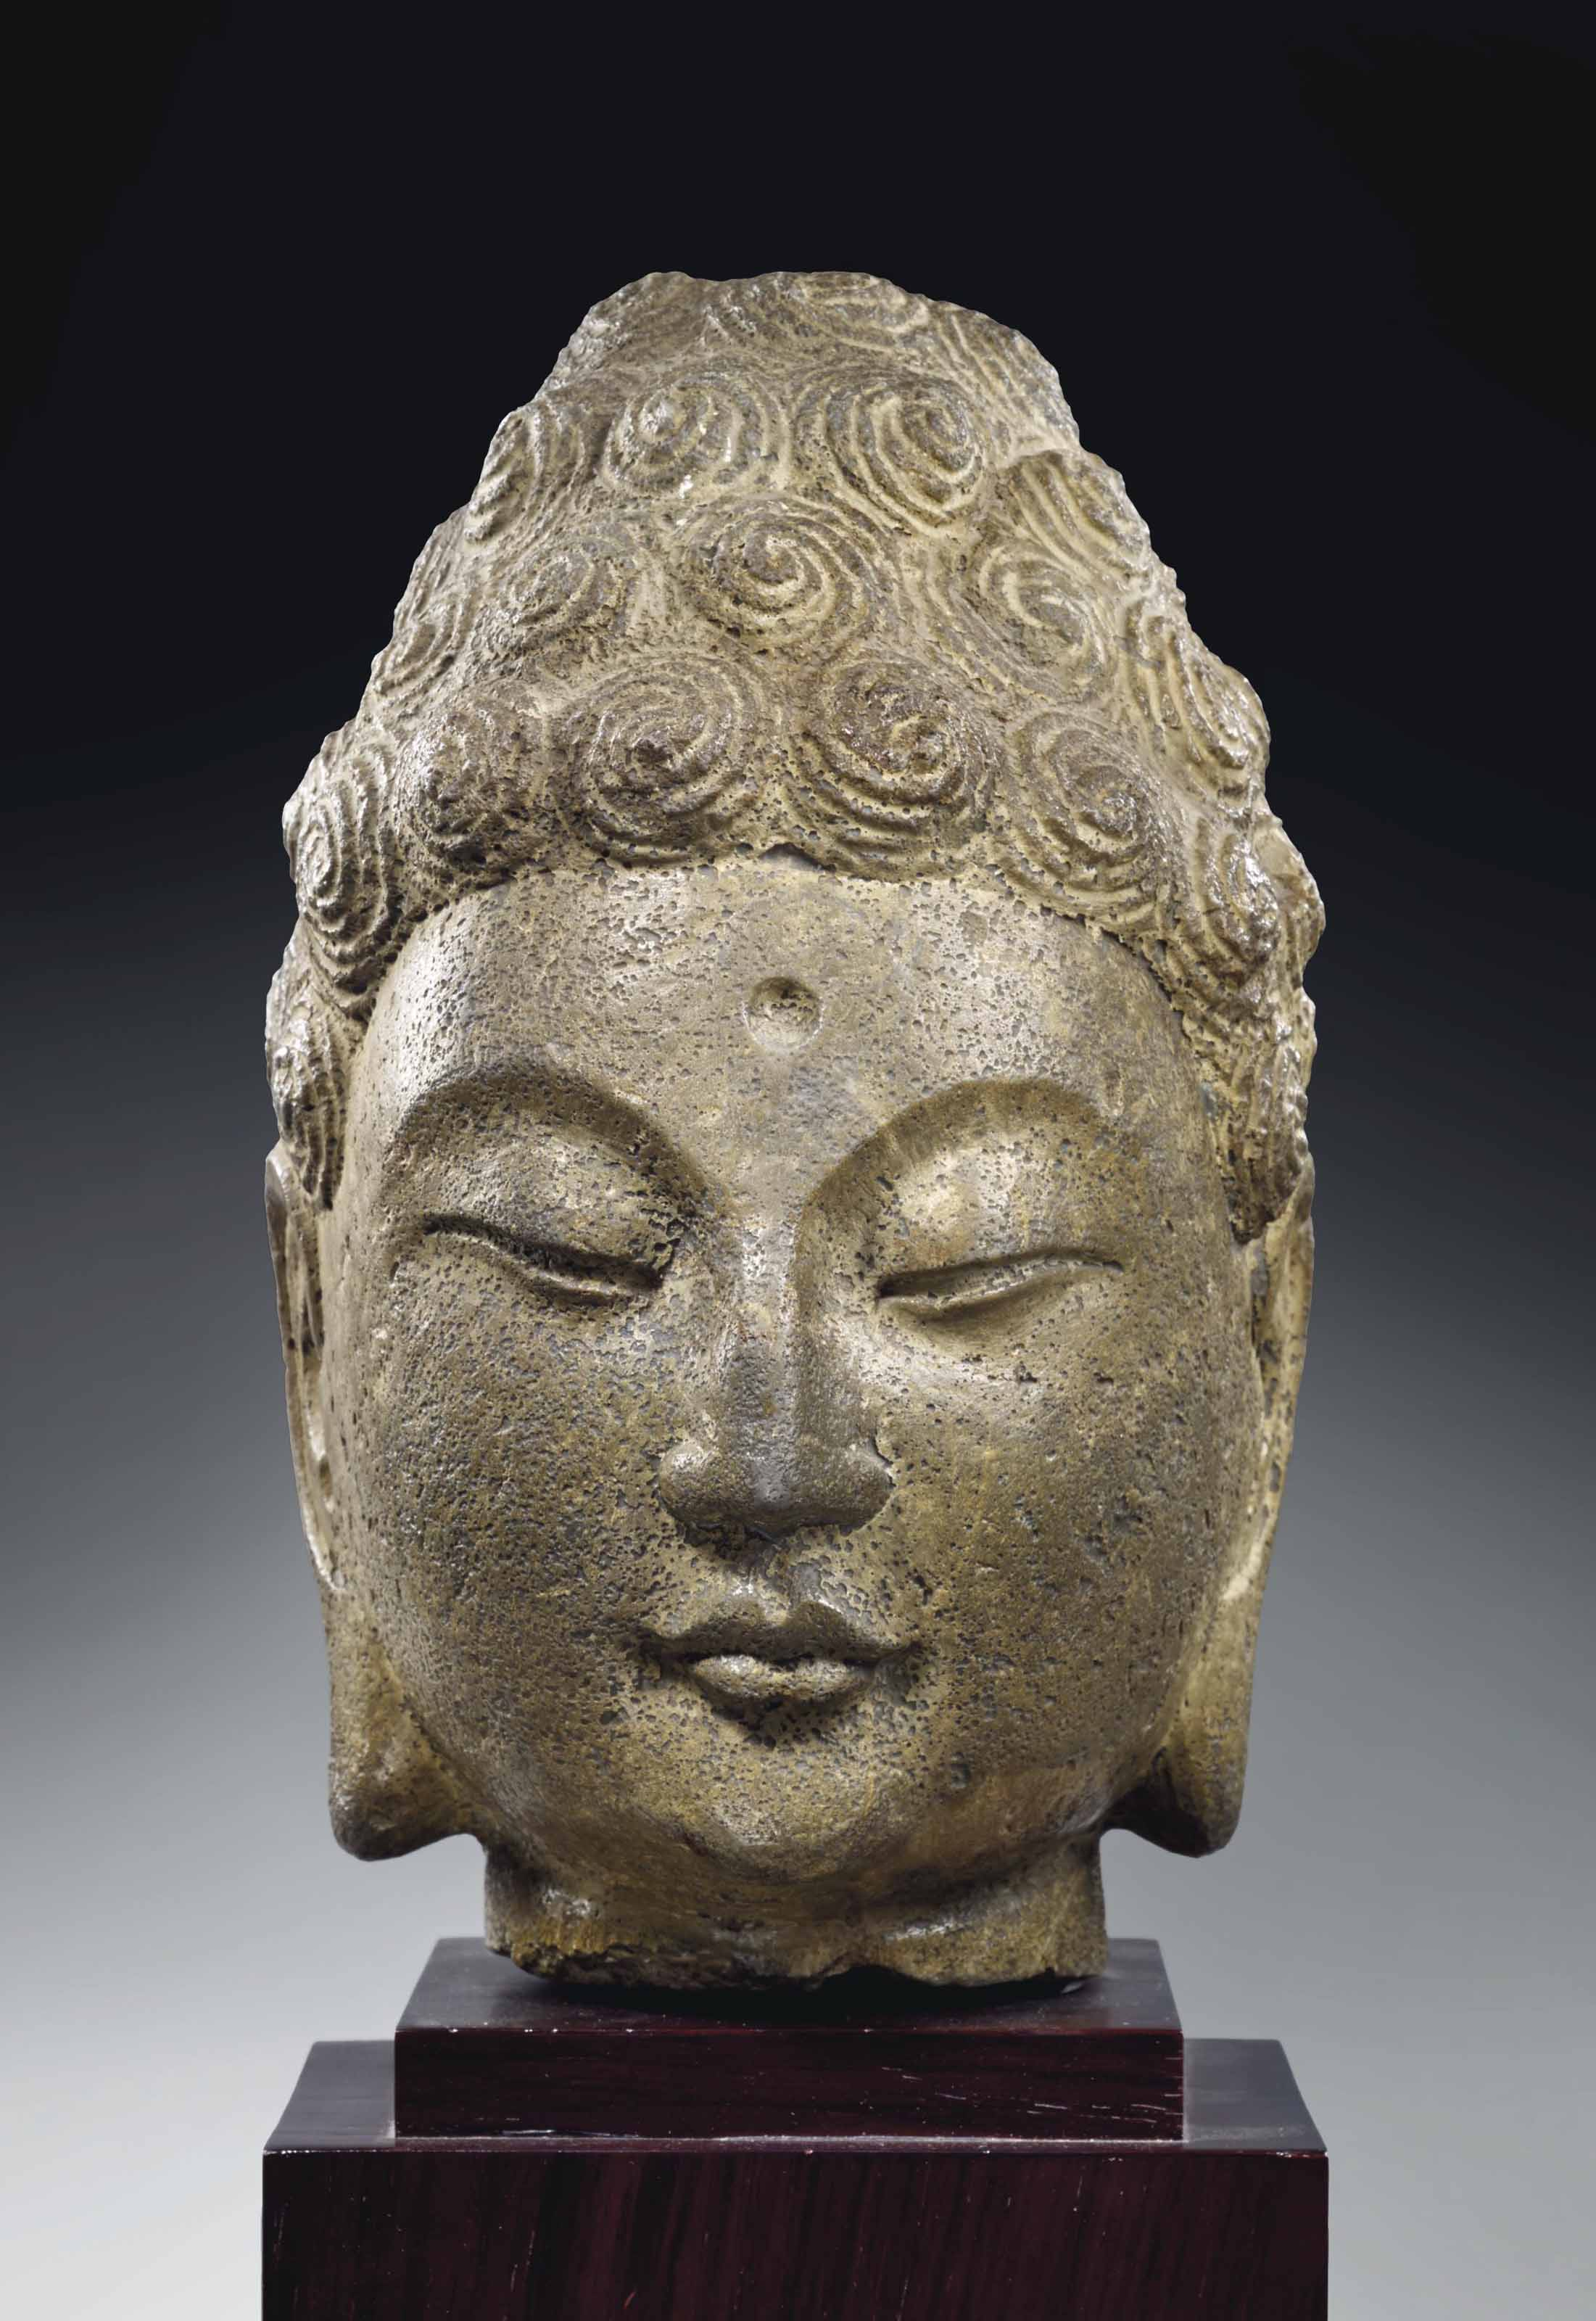 tete de bouddha shakyamuni en marbre chine dynastie sui 581 618 christie 39 s. Black Bedroom Furniture Sets. Home Design Ideas